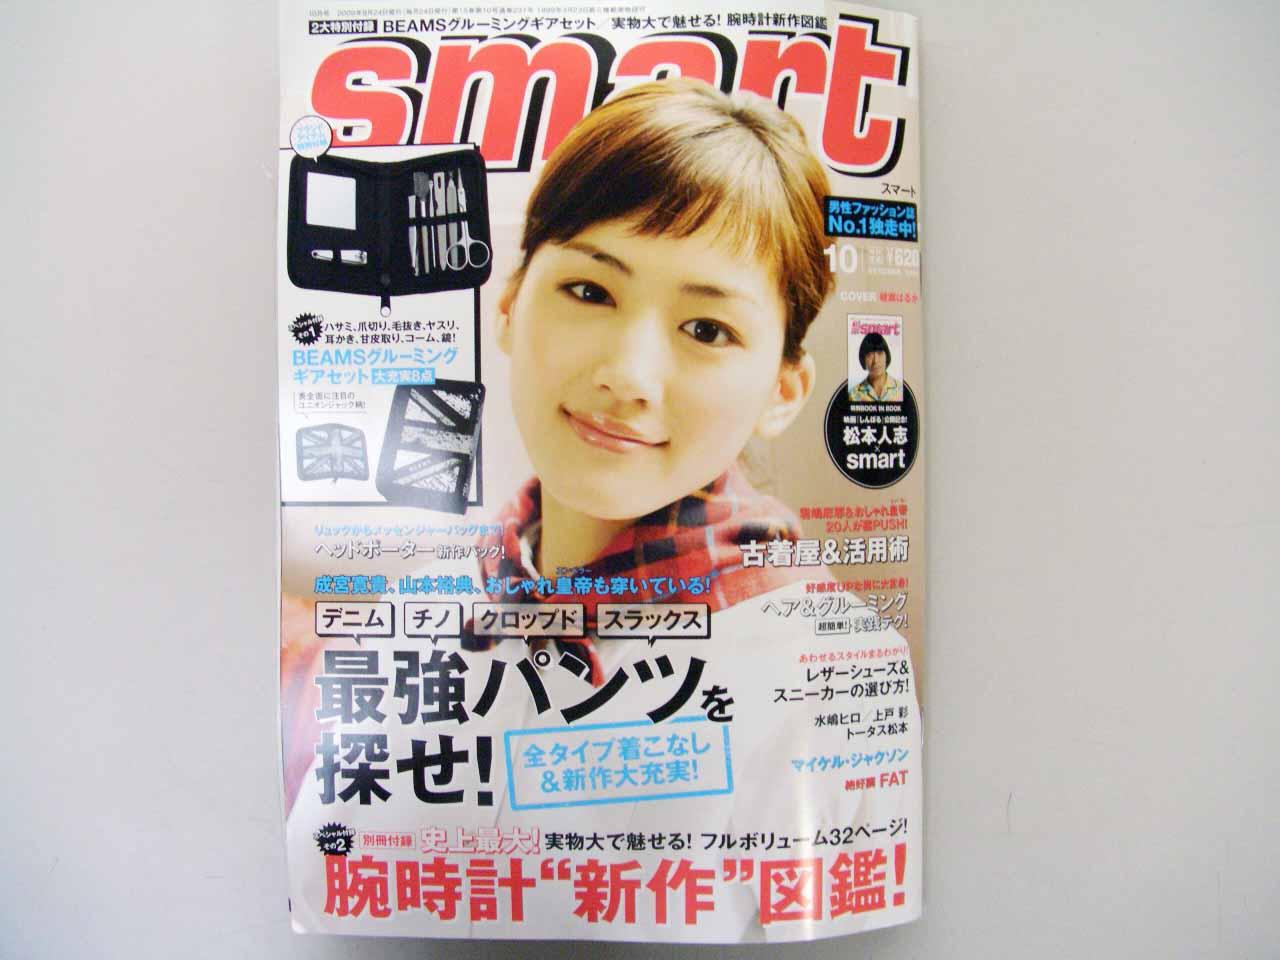 Cimg2554 私の子ども世代向けの雑誌「smart」とゆー雑誌とBEAMSのコラボレーション